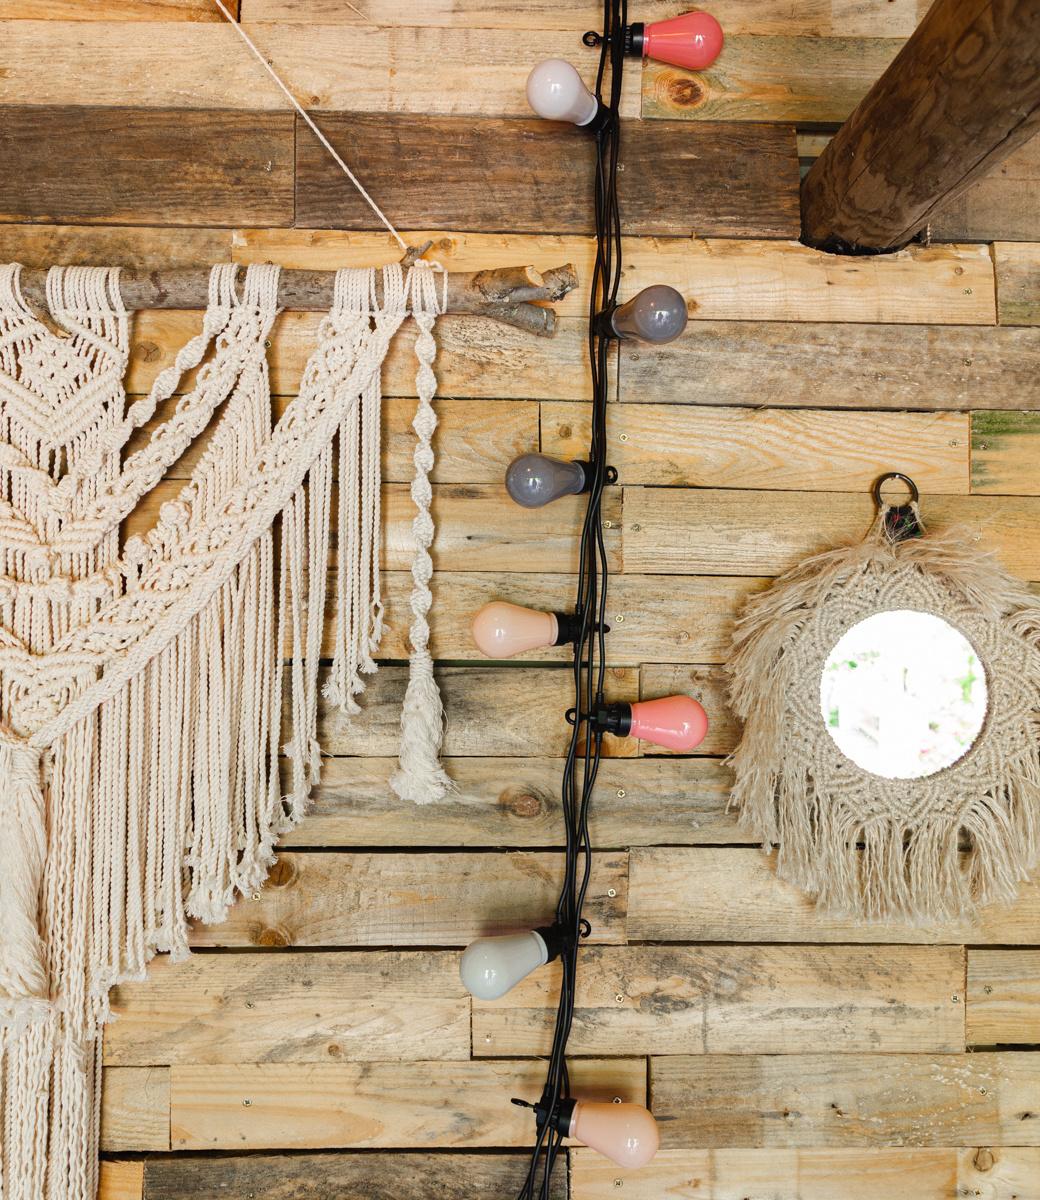 LEDR buiten feestverlichting roze en grijs - Outdoor Patio Lichtslinger Dirty Rose - 10 LED lampen - Edison Bulbs-2